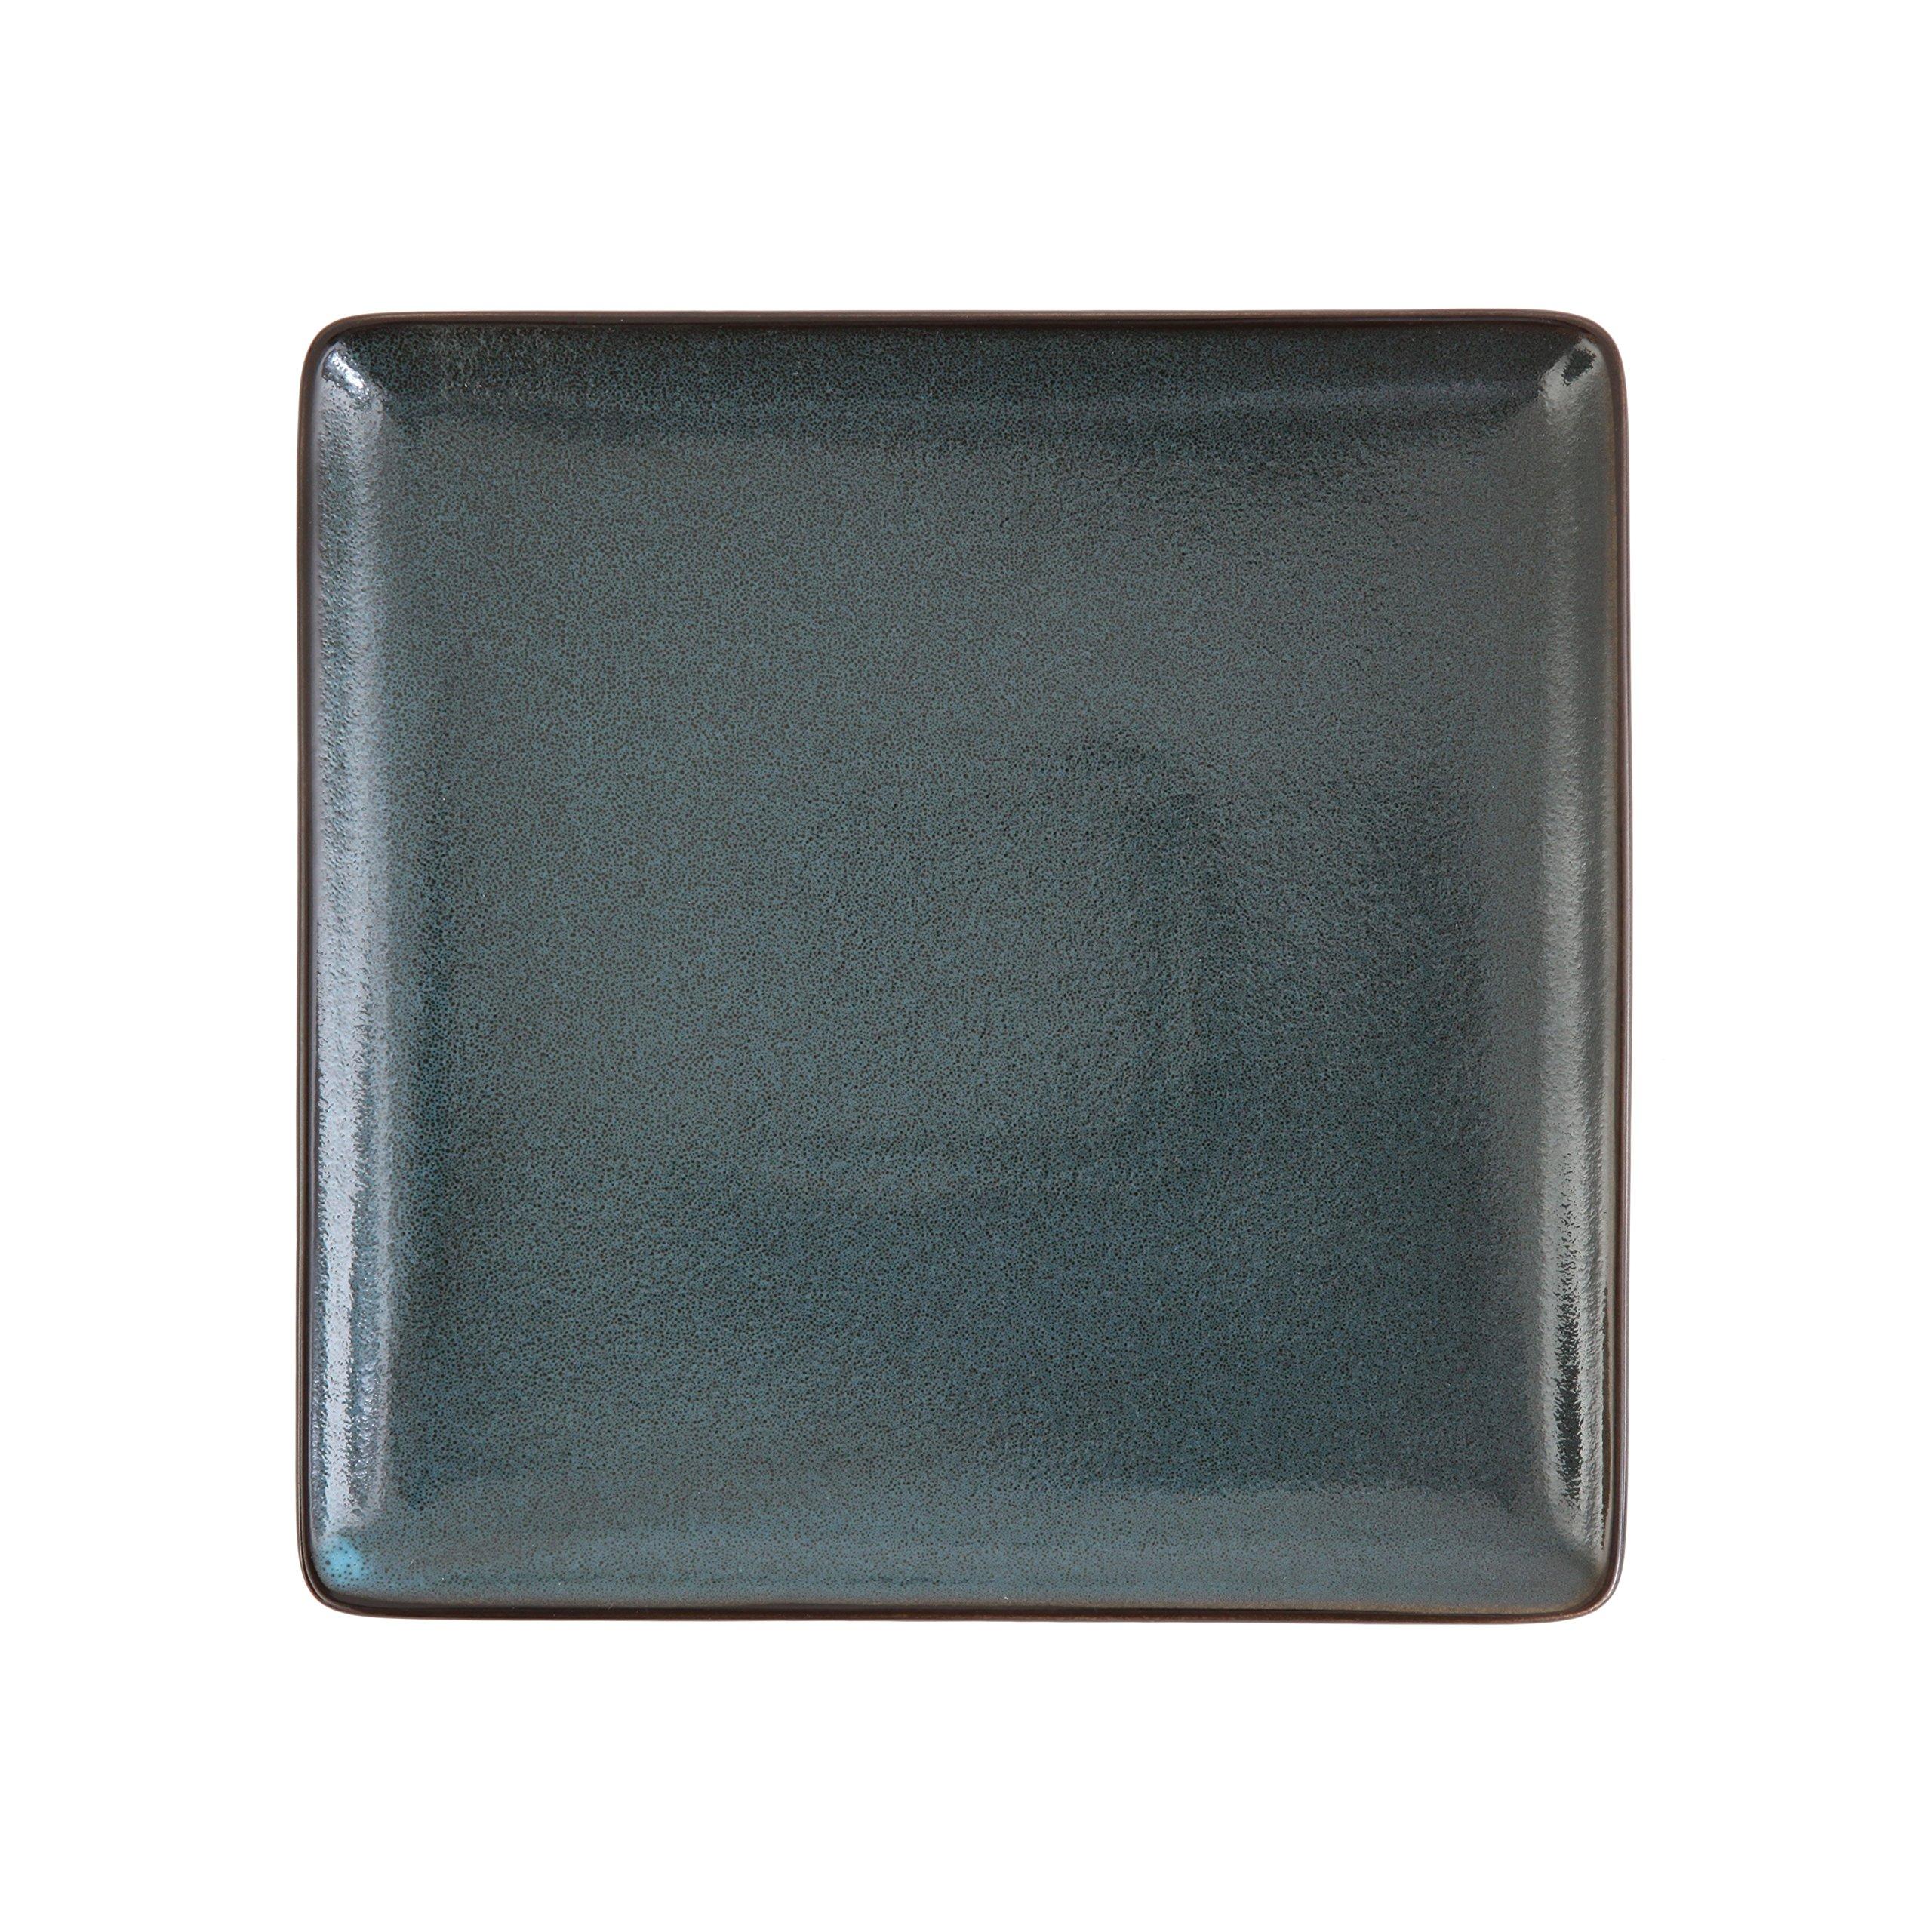 D&V 6 Piece Stōn Porcelain Dinnerware Square Dinner Plate Set, 9'', Twilight